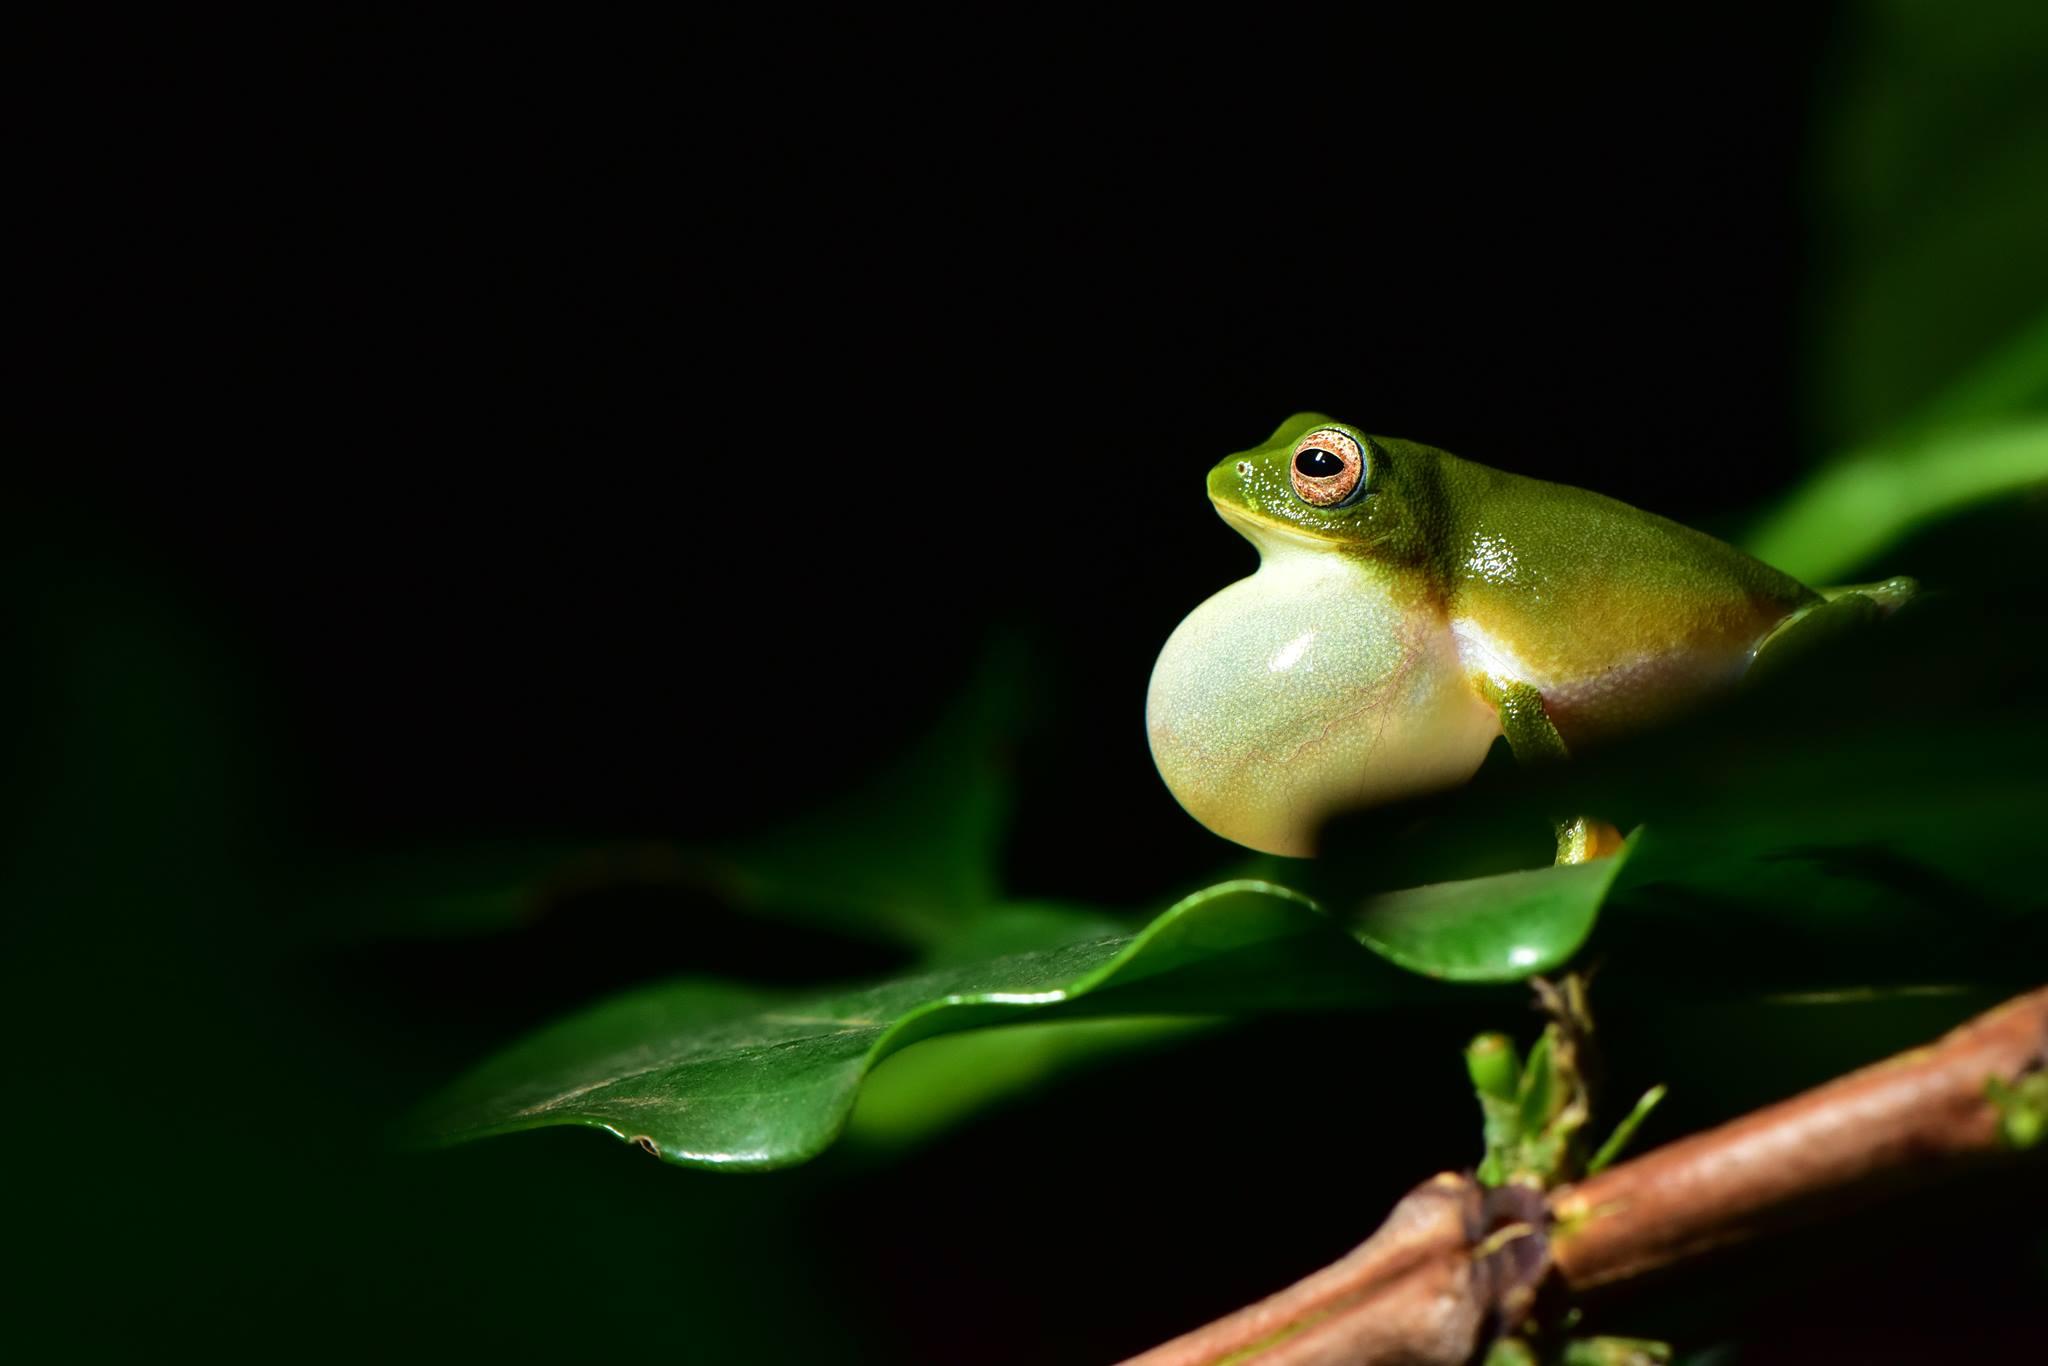 Bush Frog, anamalais, amphibians, pollachi papyrus, anamalai tiger reserve, raorchestes jayarami,